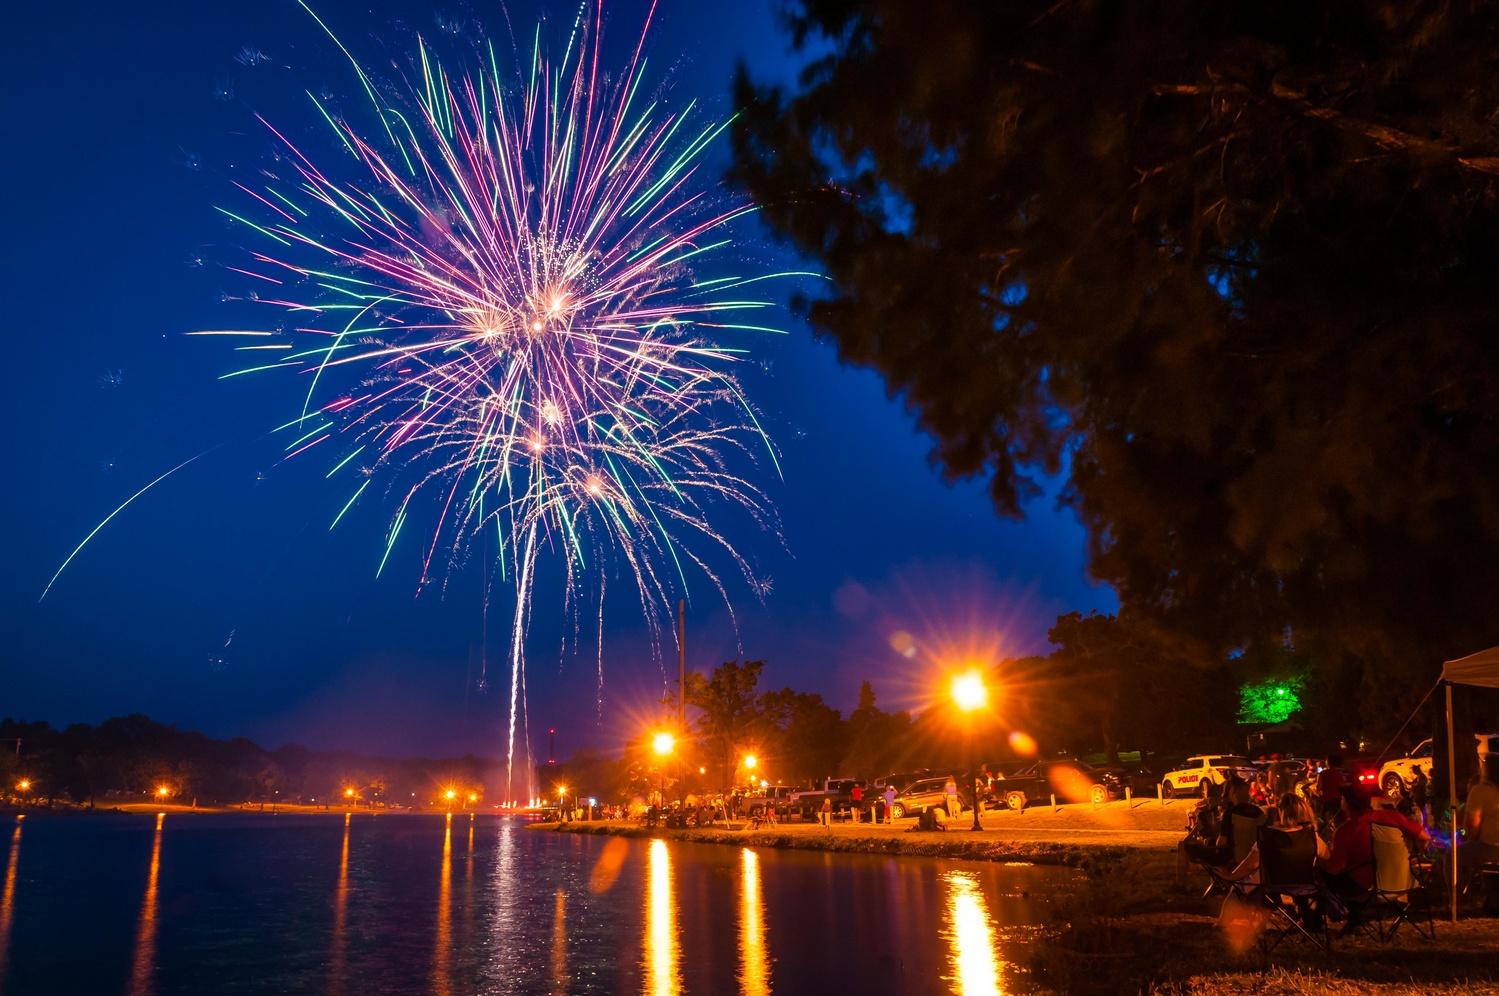 Fireworks, Ada, Oklahoma by Richard Barron